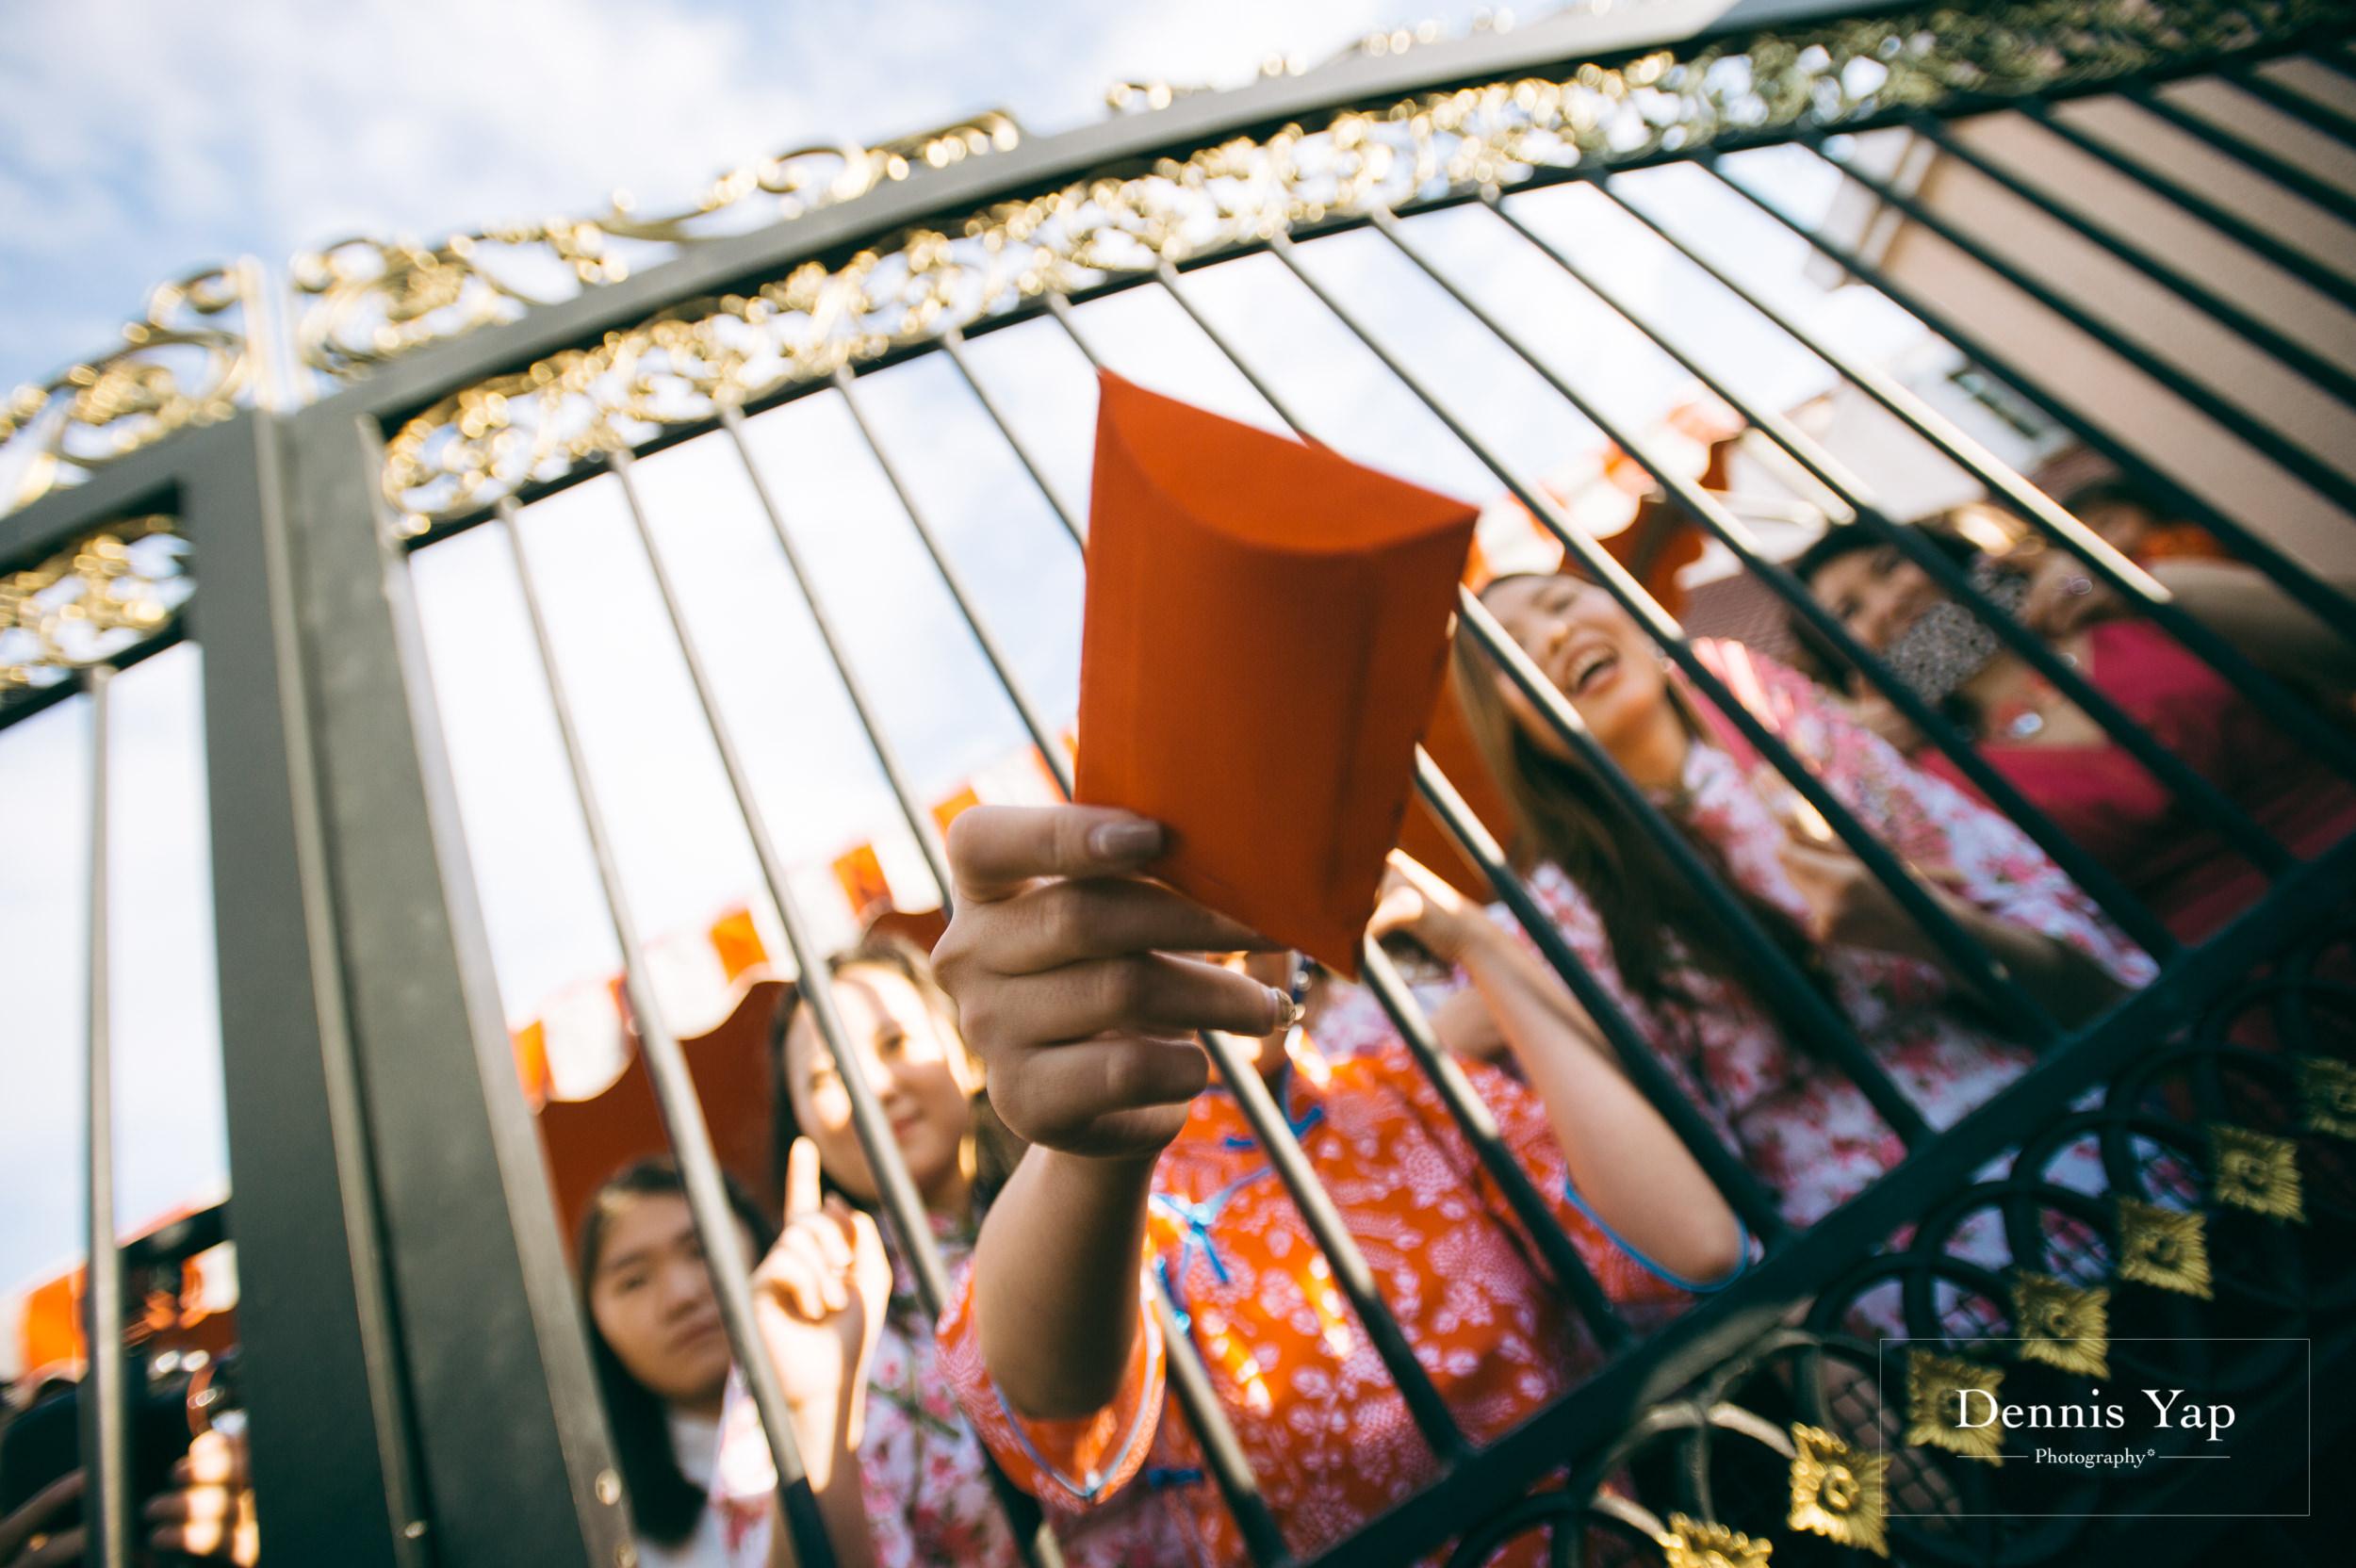 kuan rachel wedding day kuala lumpur melbourne gate crash dennis yap malaysia wedding photographer-6.jpg